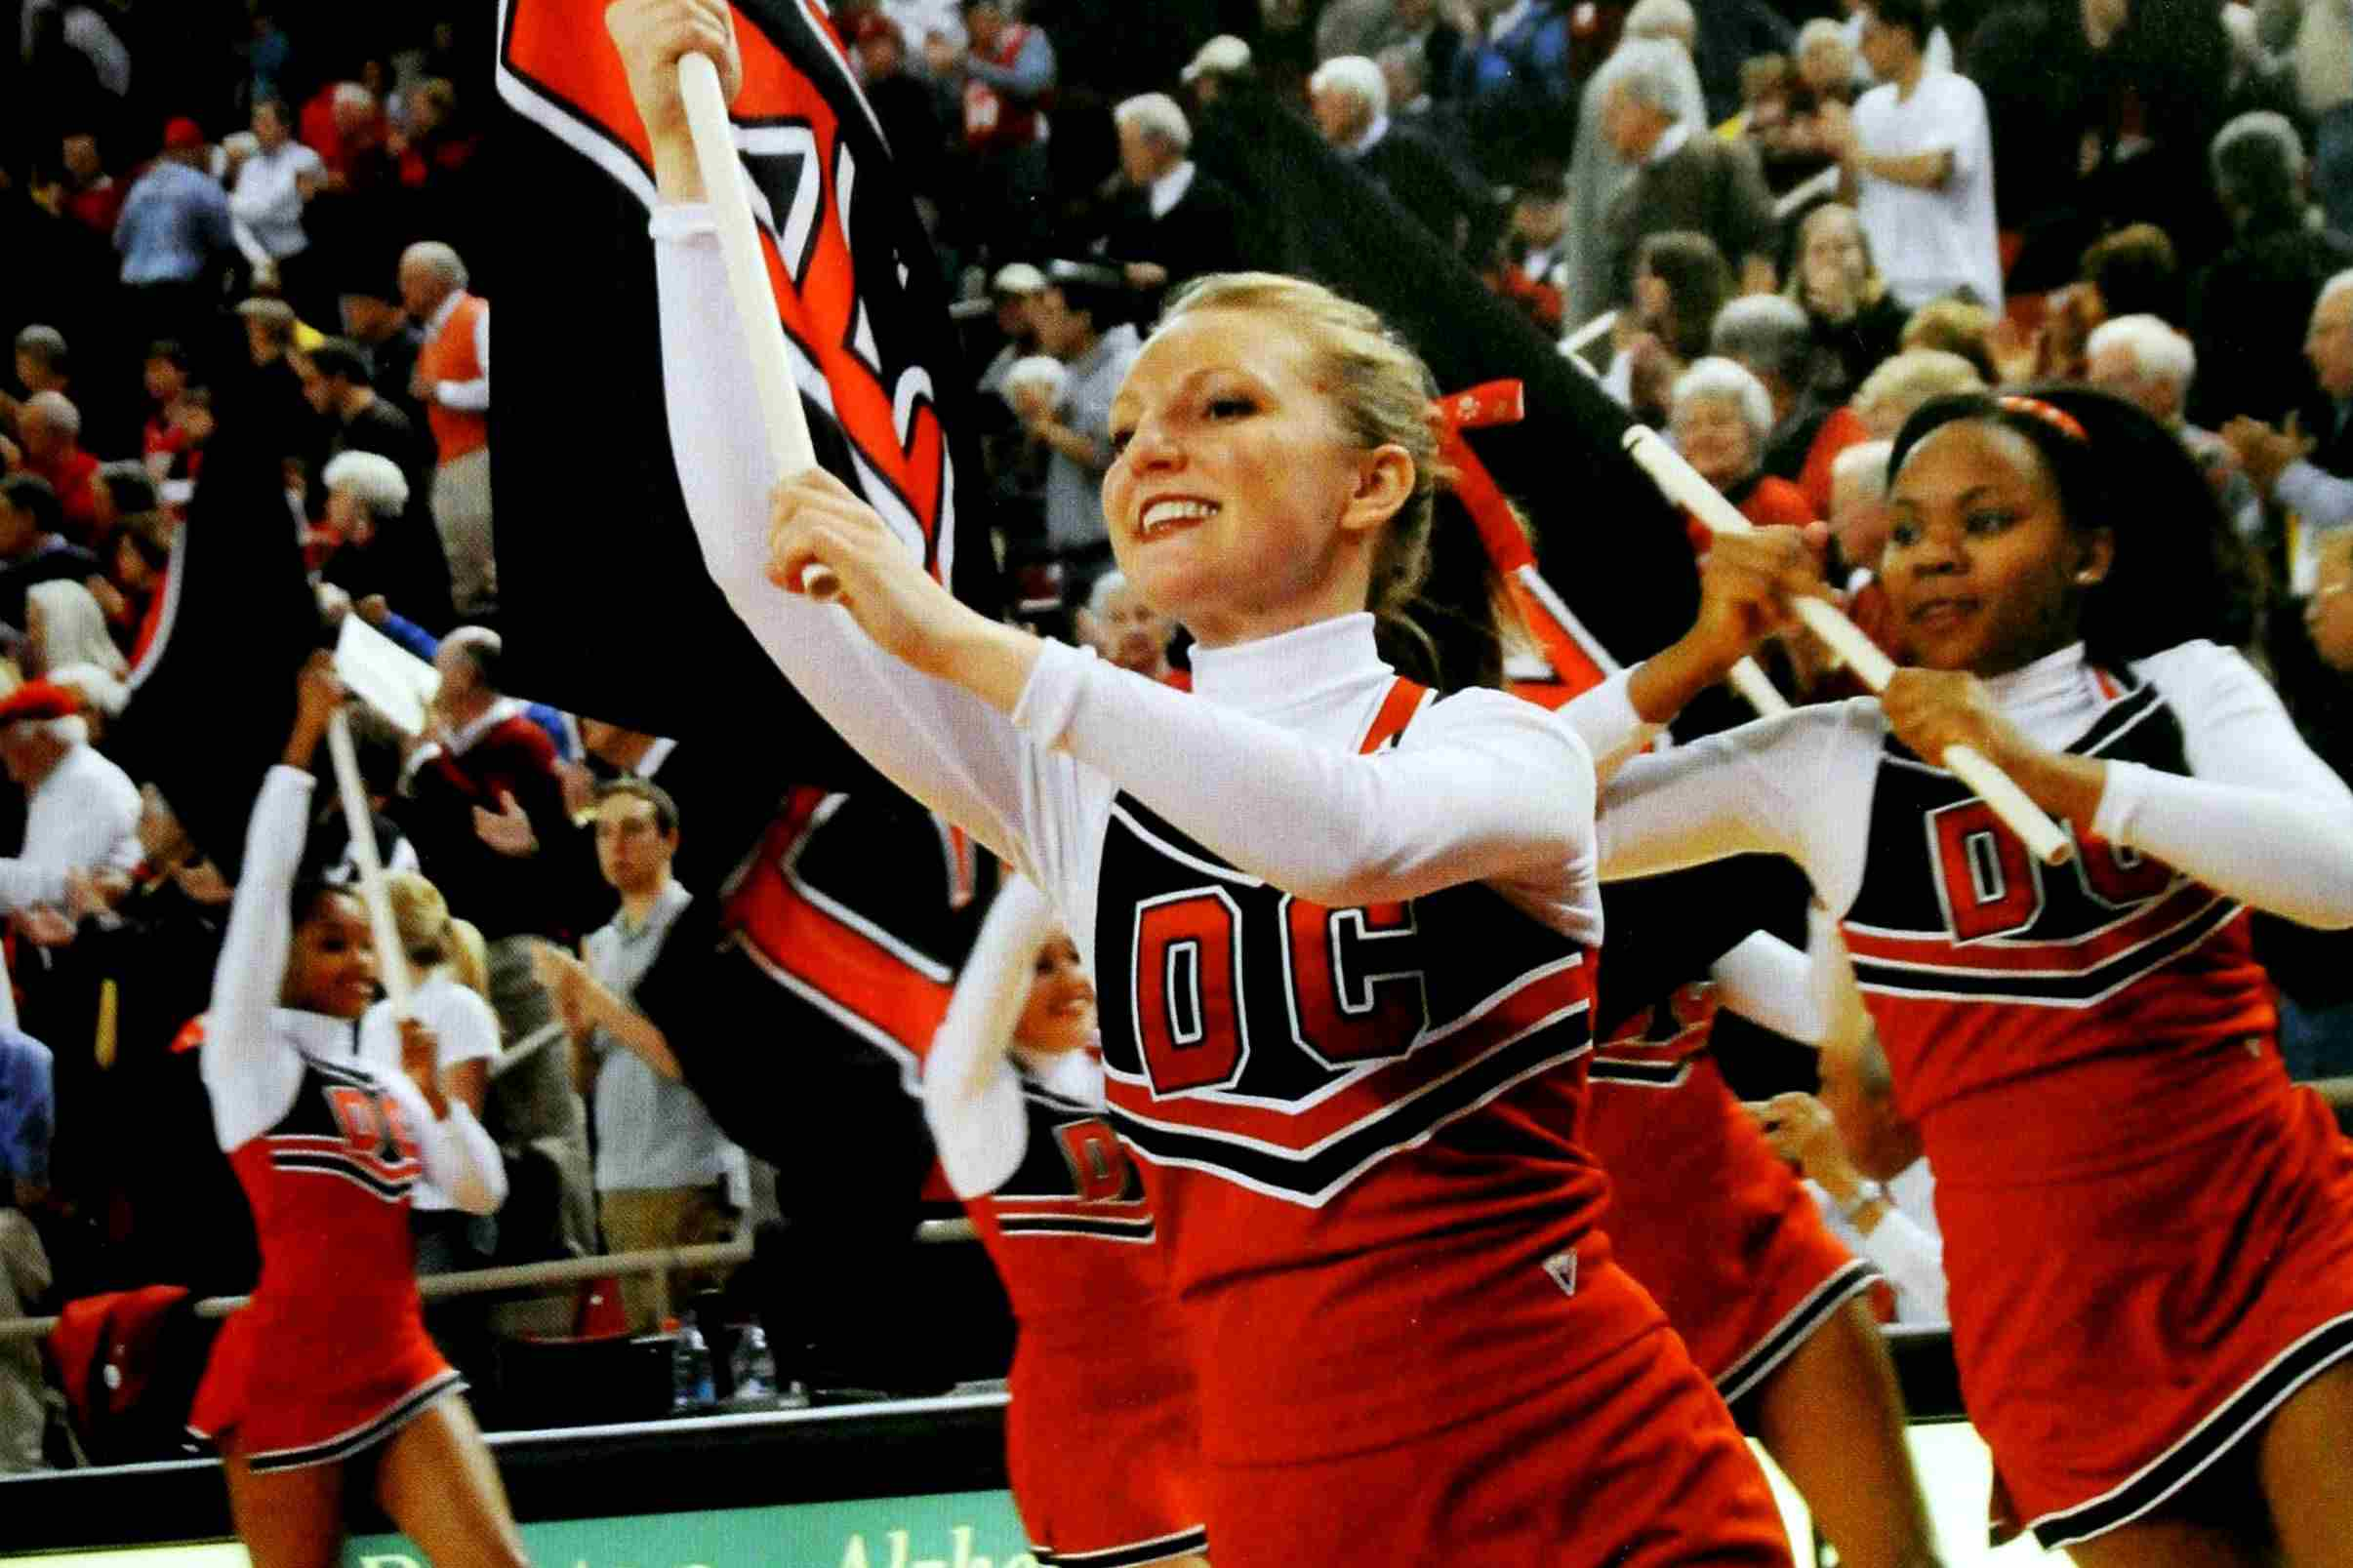 Davidson College cheerleaders perform a flag routine